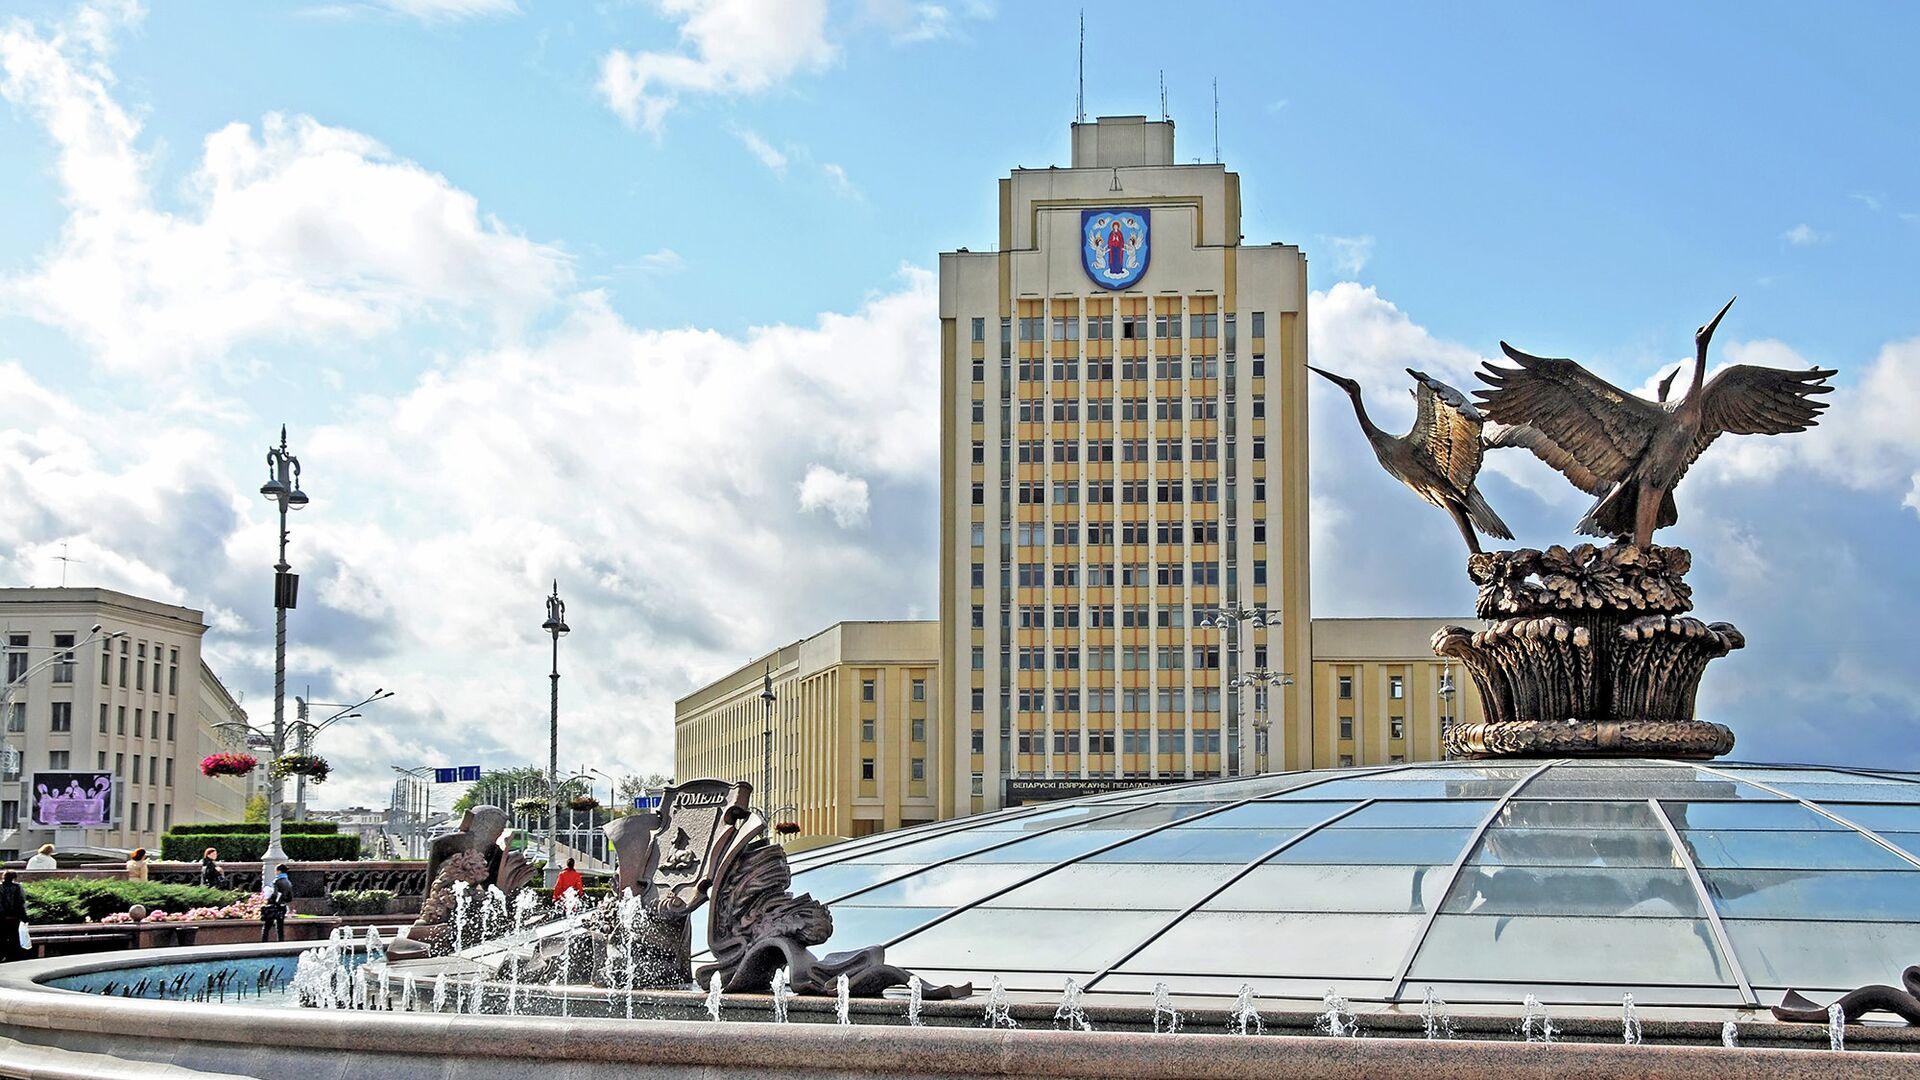 Площадь Независимости, Минск - РИА Новости, 1920, 07.05.2021